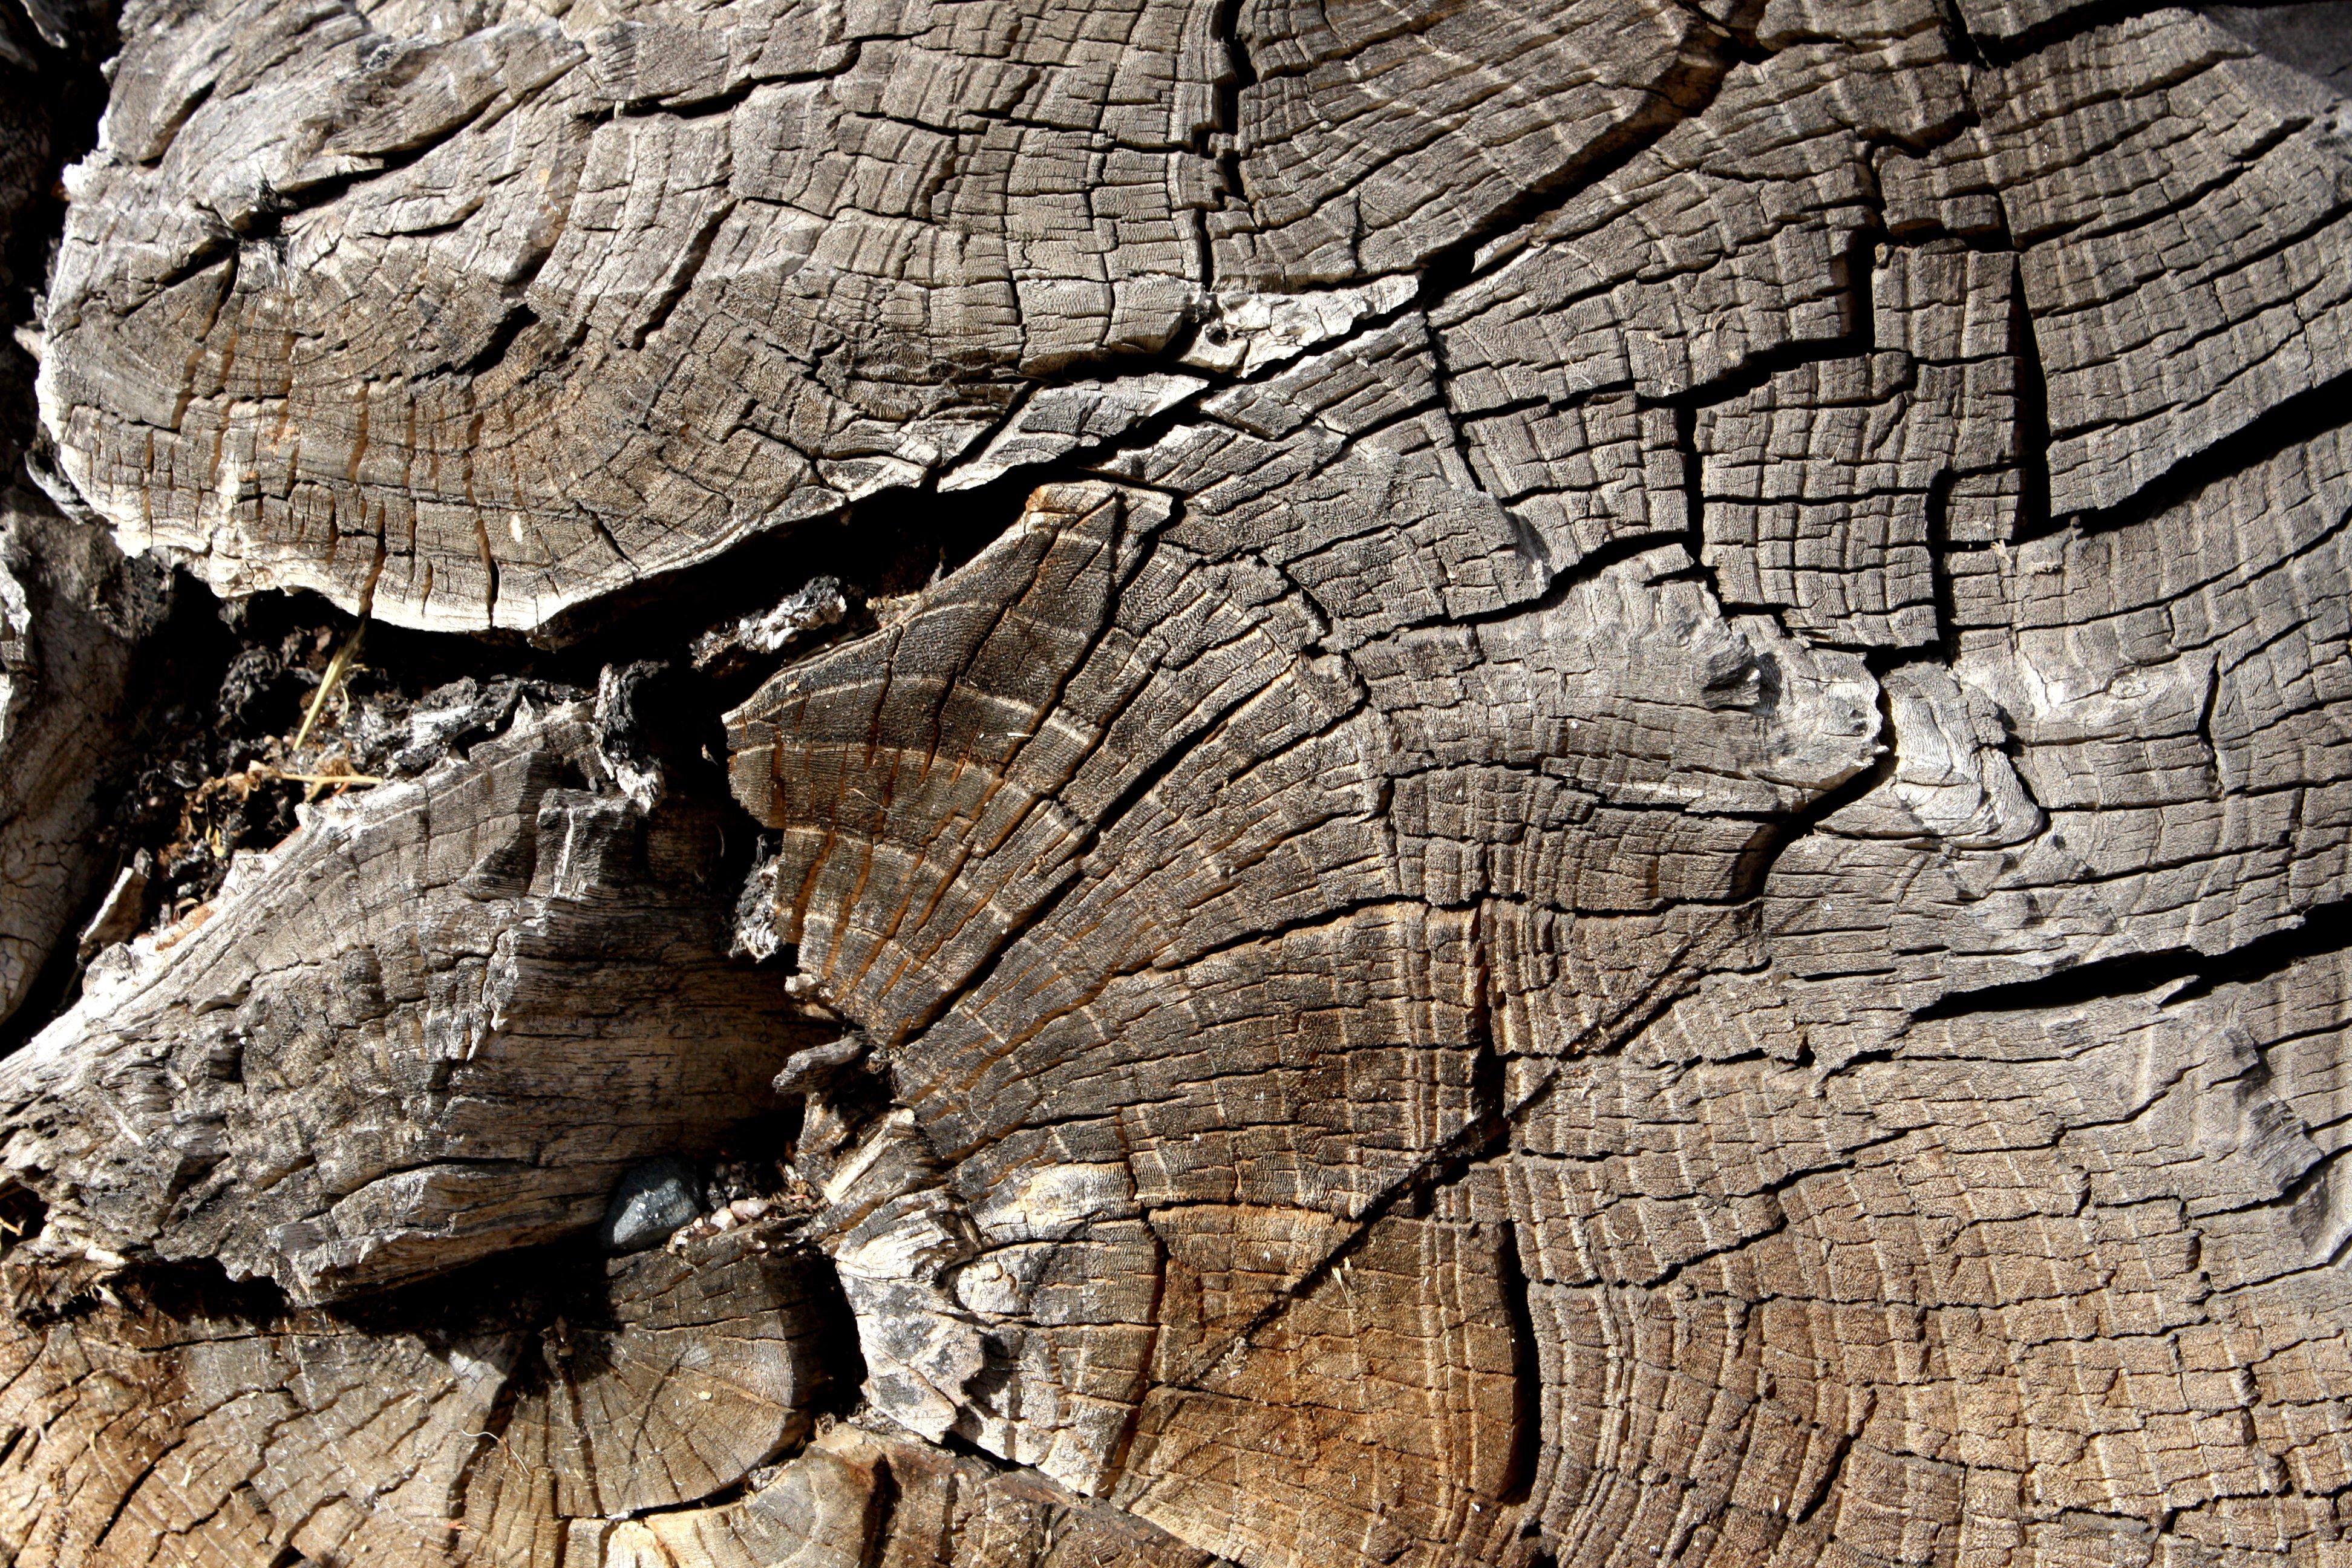 Log End Closeup Texture Picture Free Photograph Photos